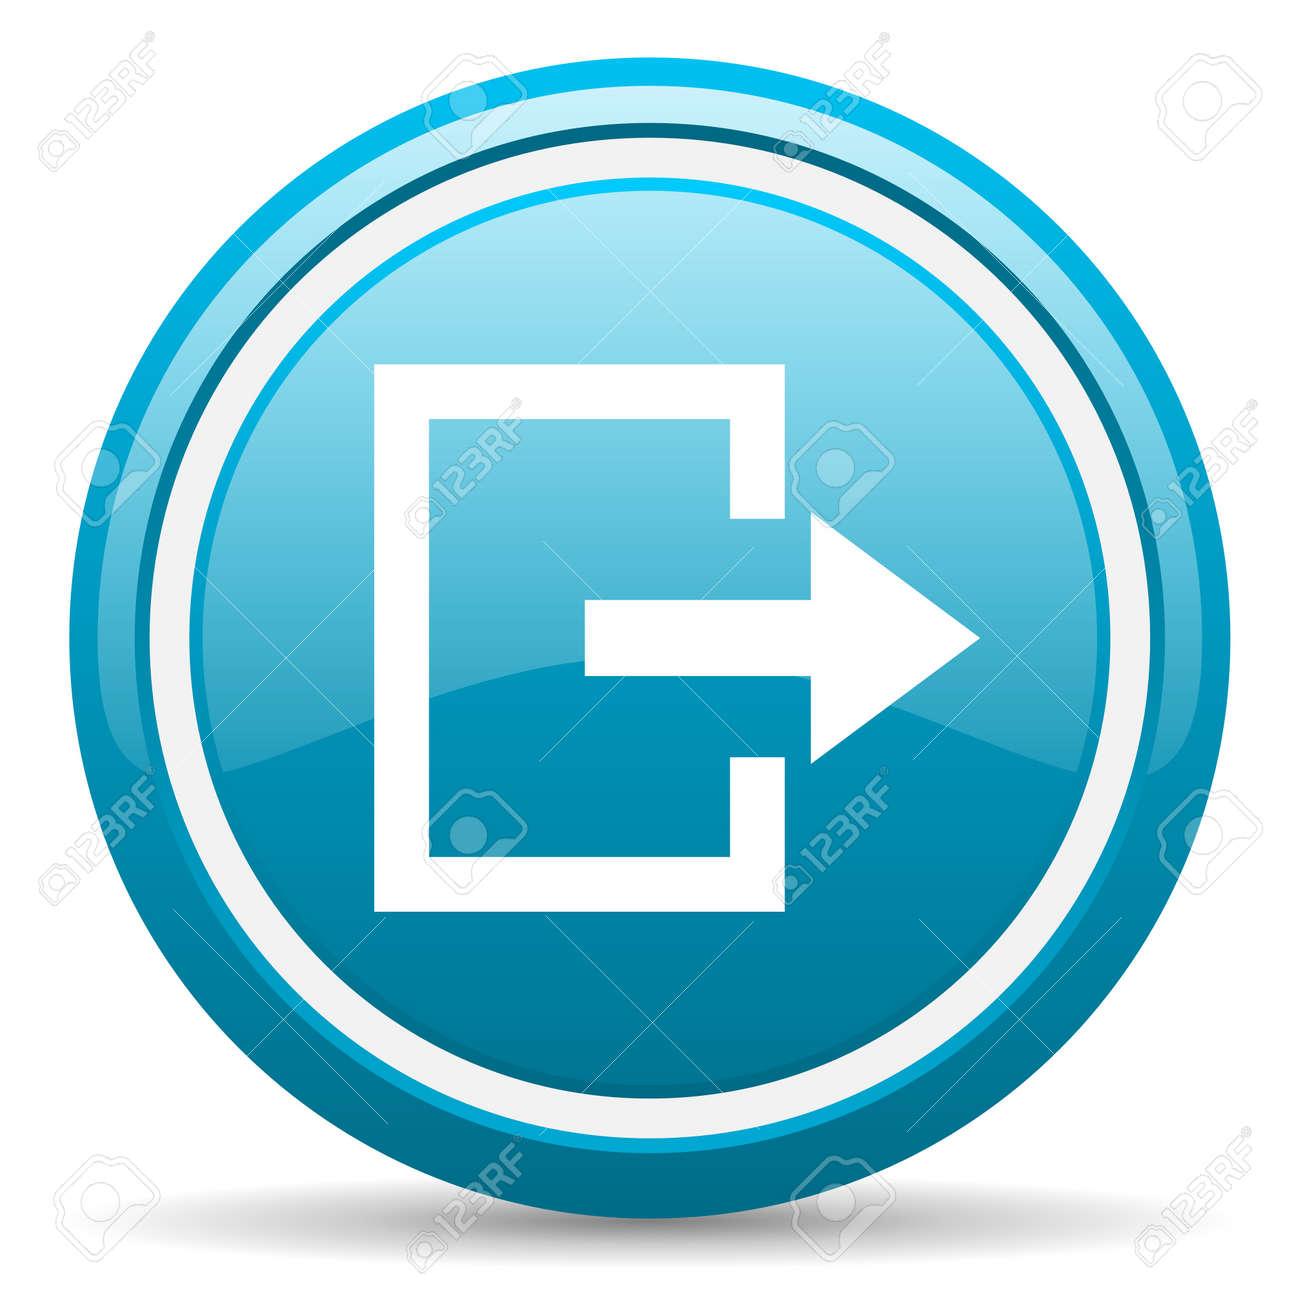 blue circle glossy web icon with shadow on white background illustration Stock Illustration - 17138979